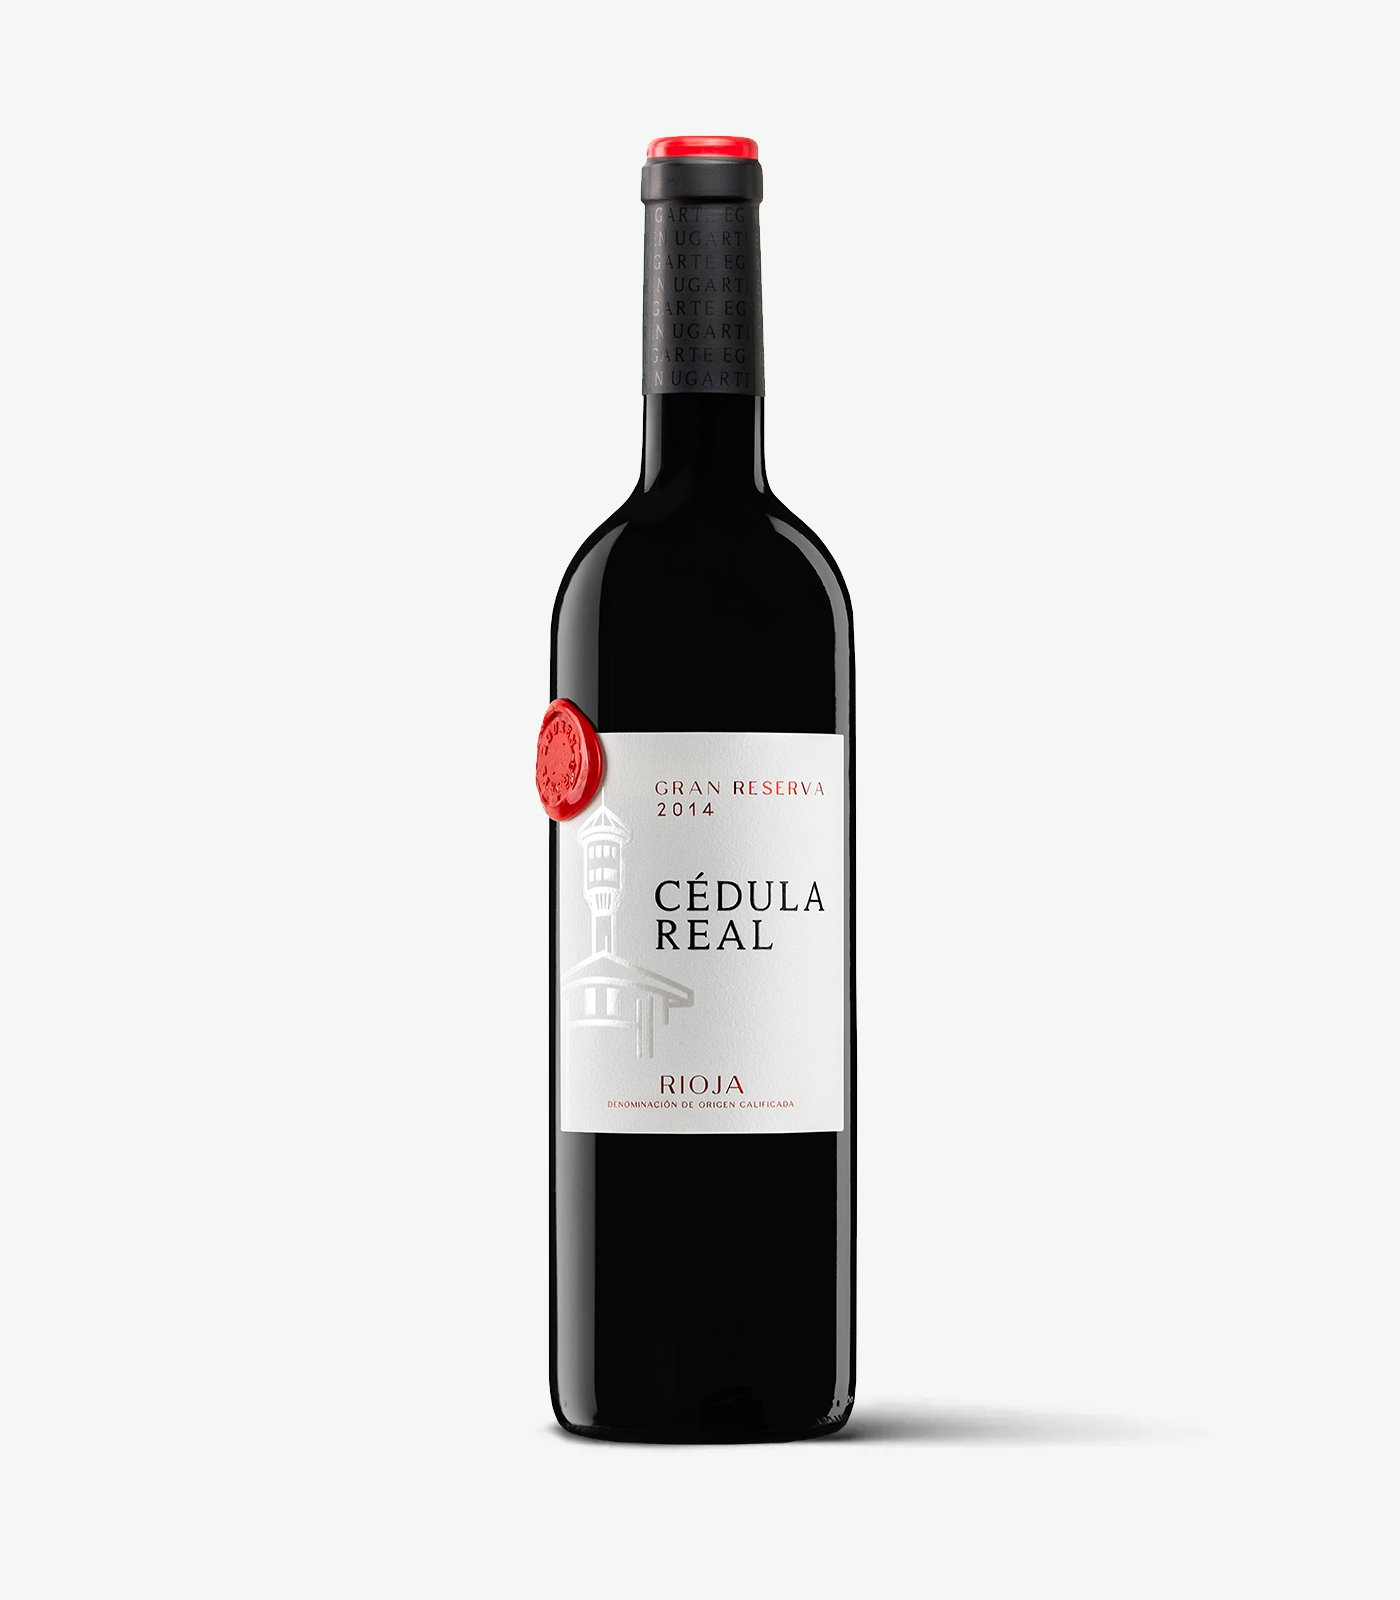 Comprar vino online gran reserva 2014 Rioja cédula real